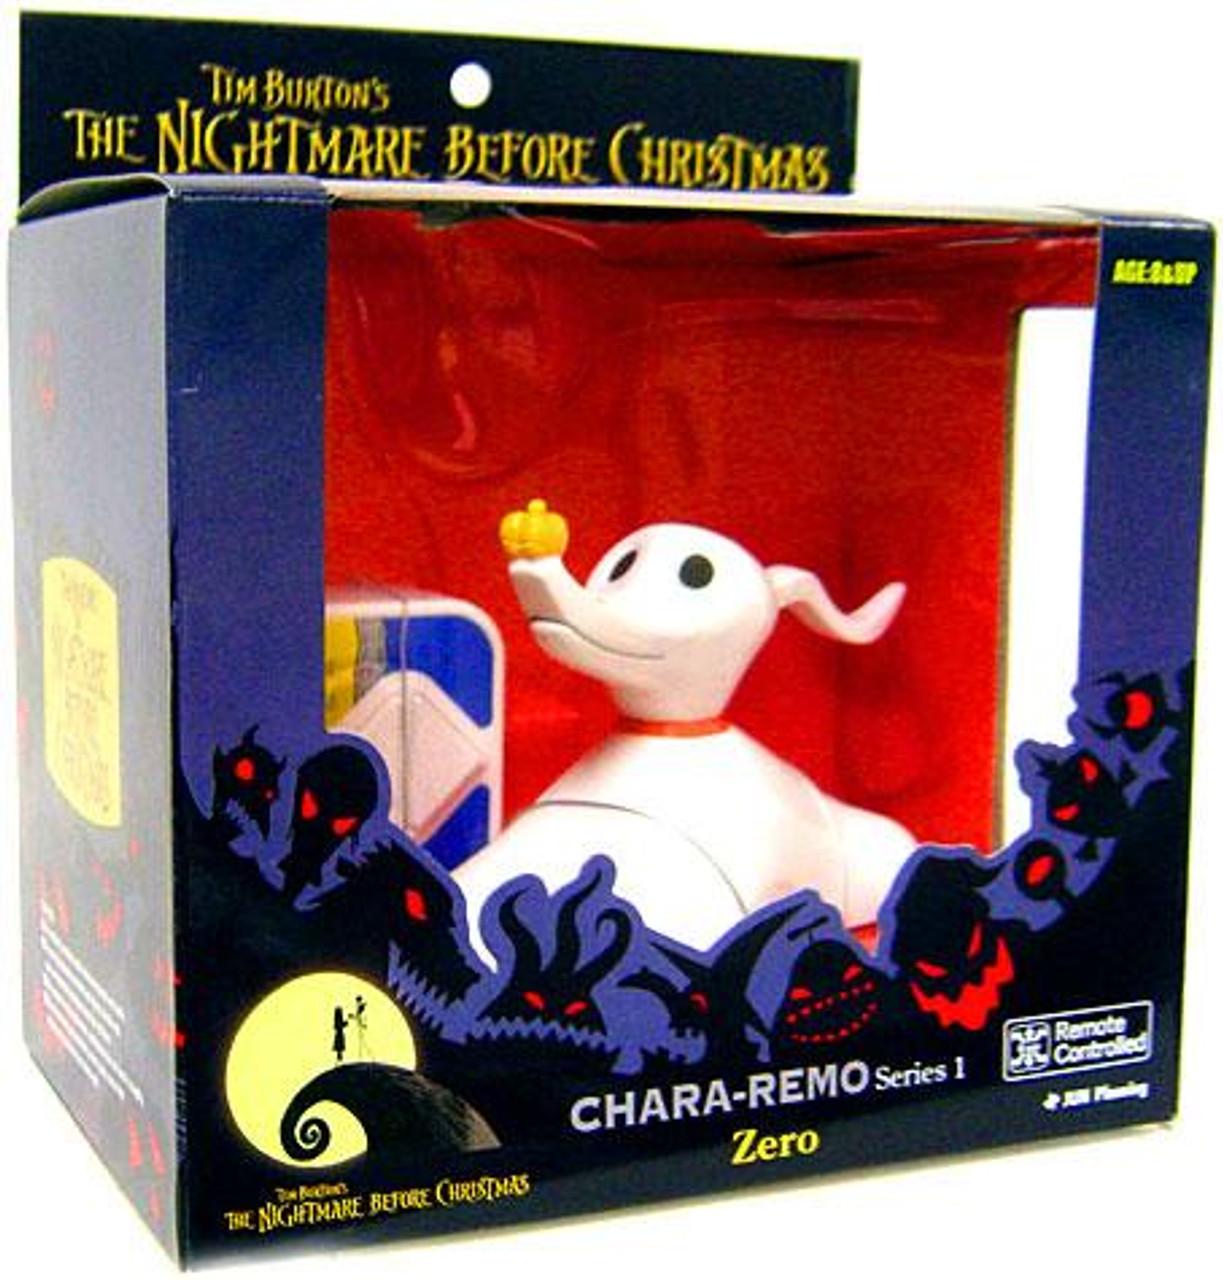 The Nightmare Before Christmas Chara-Remo Series 1 Zero R/C Vehicle